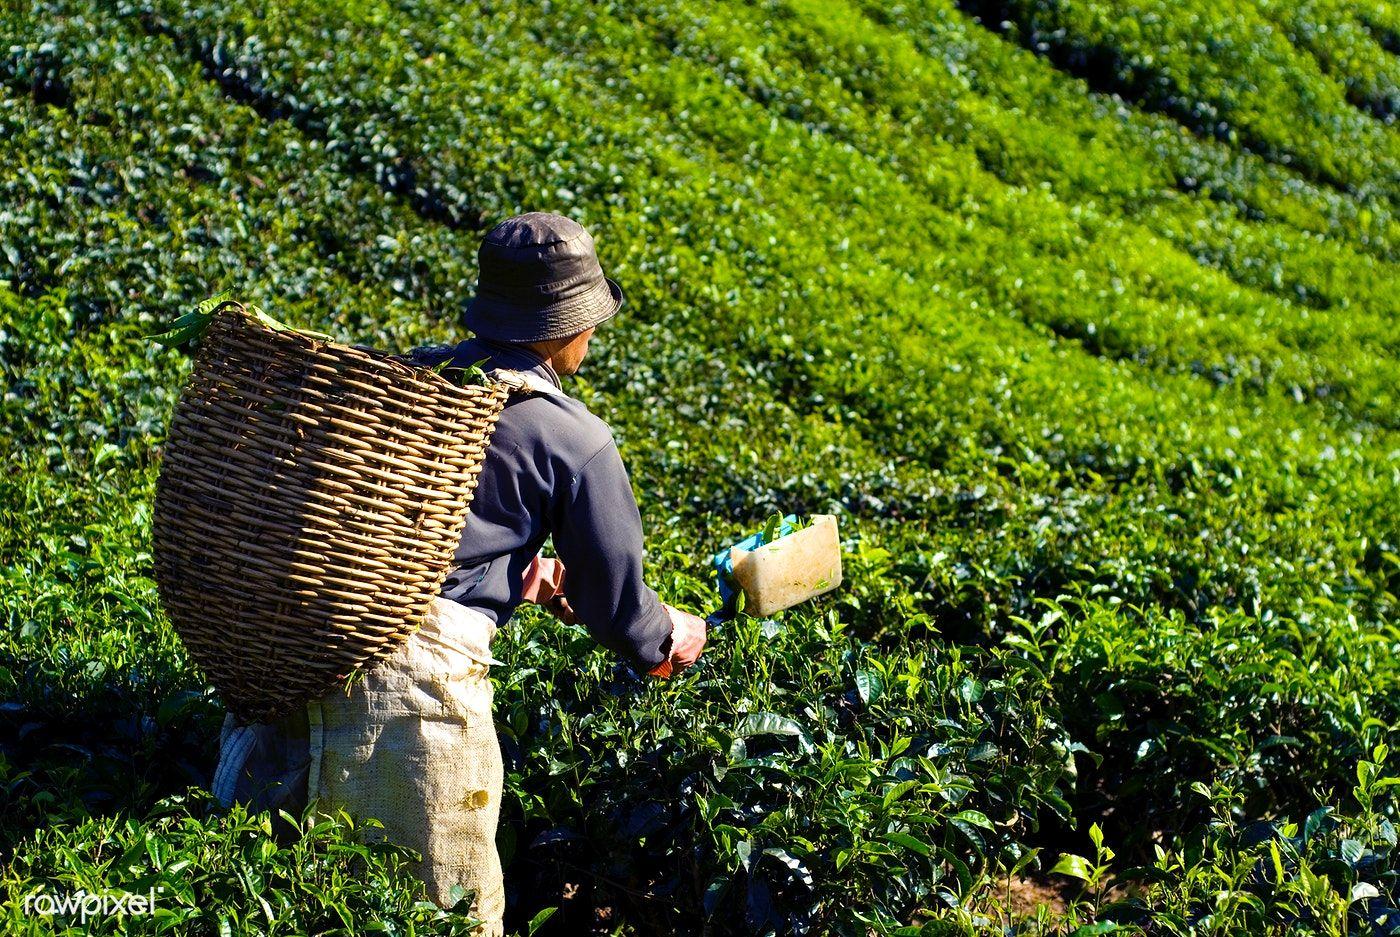 Tea picker harvesting tea leaves premium image by